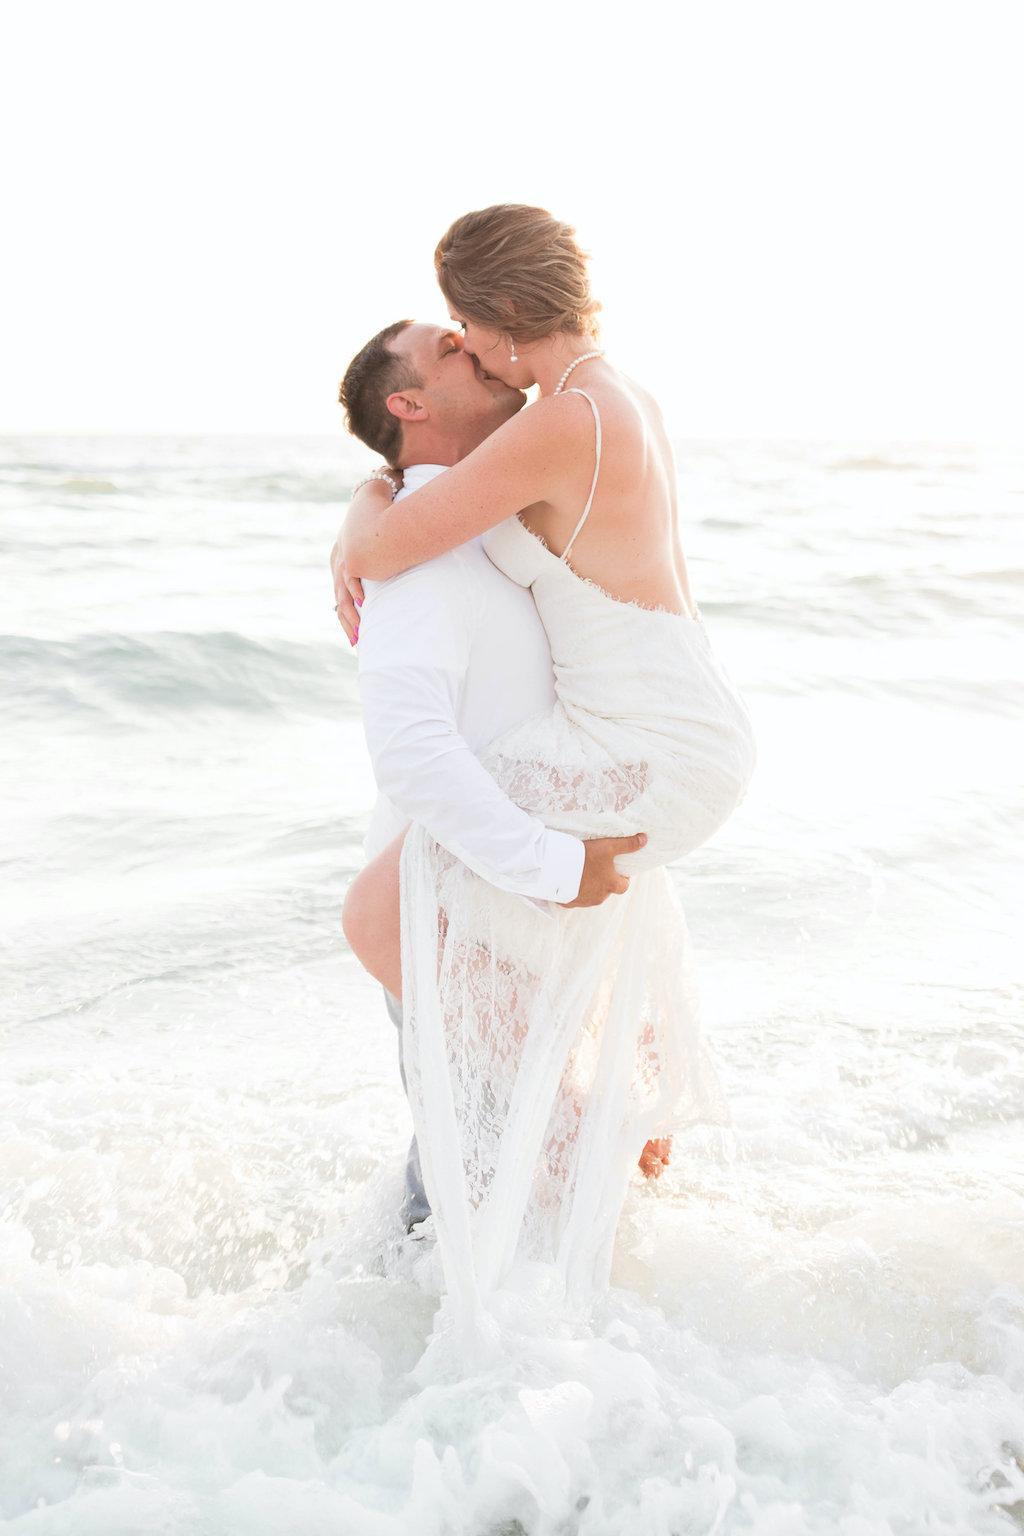 Tampa Bay Wedding Planner Elegant Affairs by Design